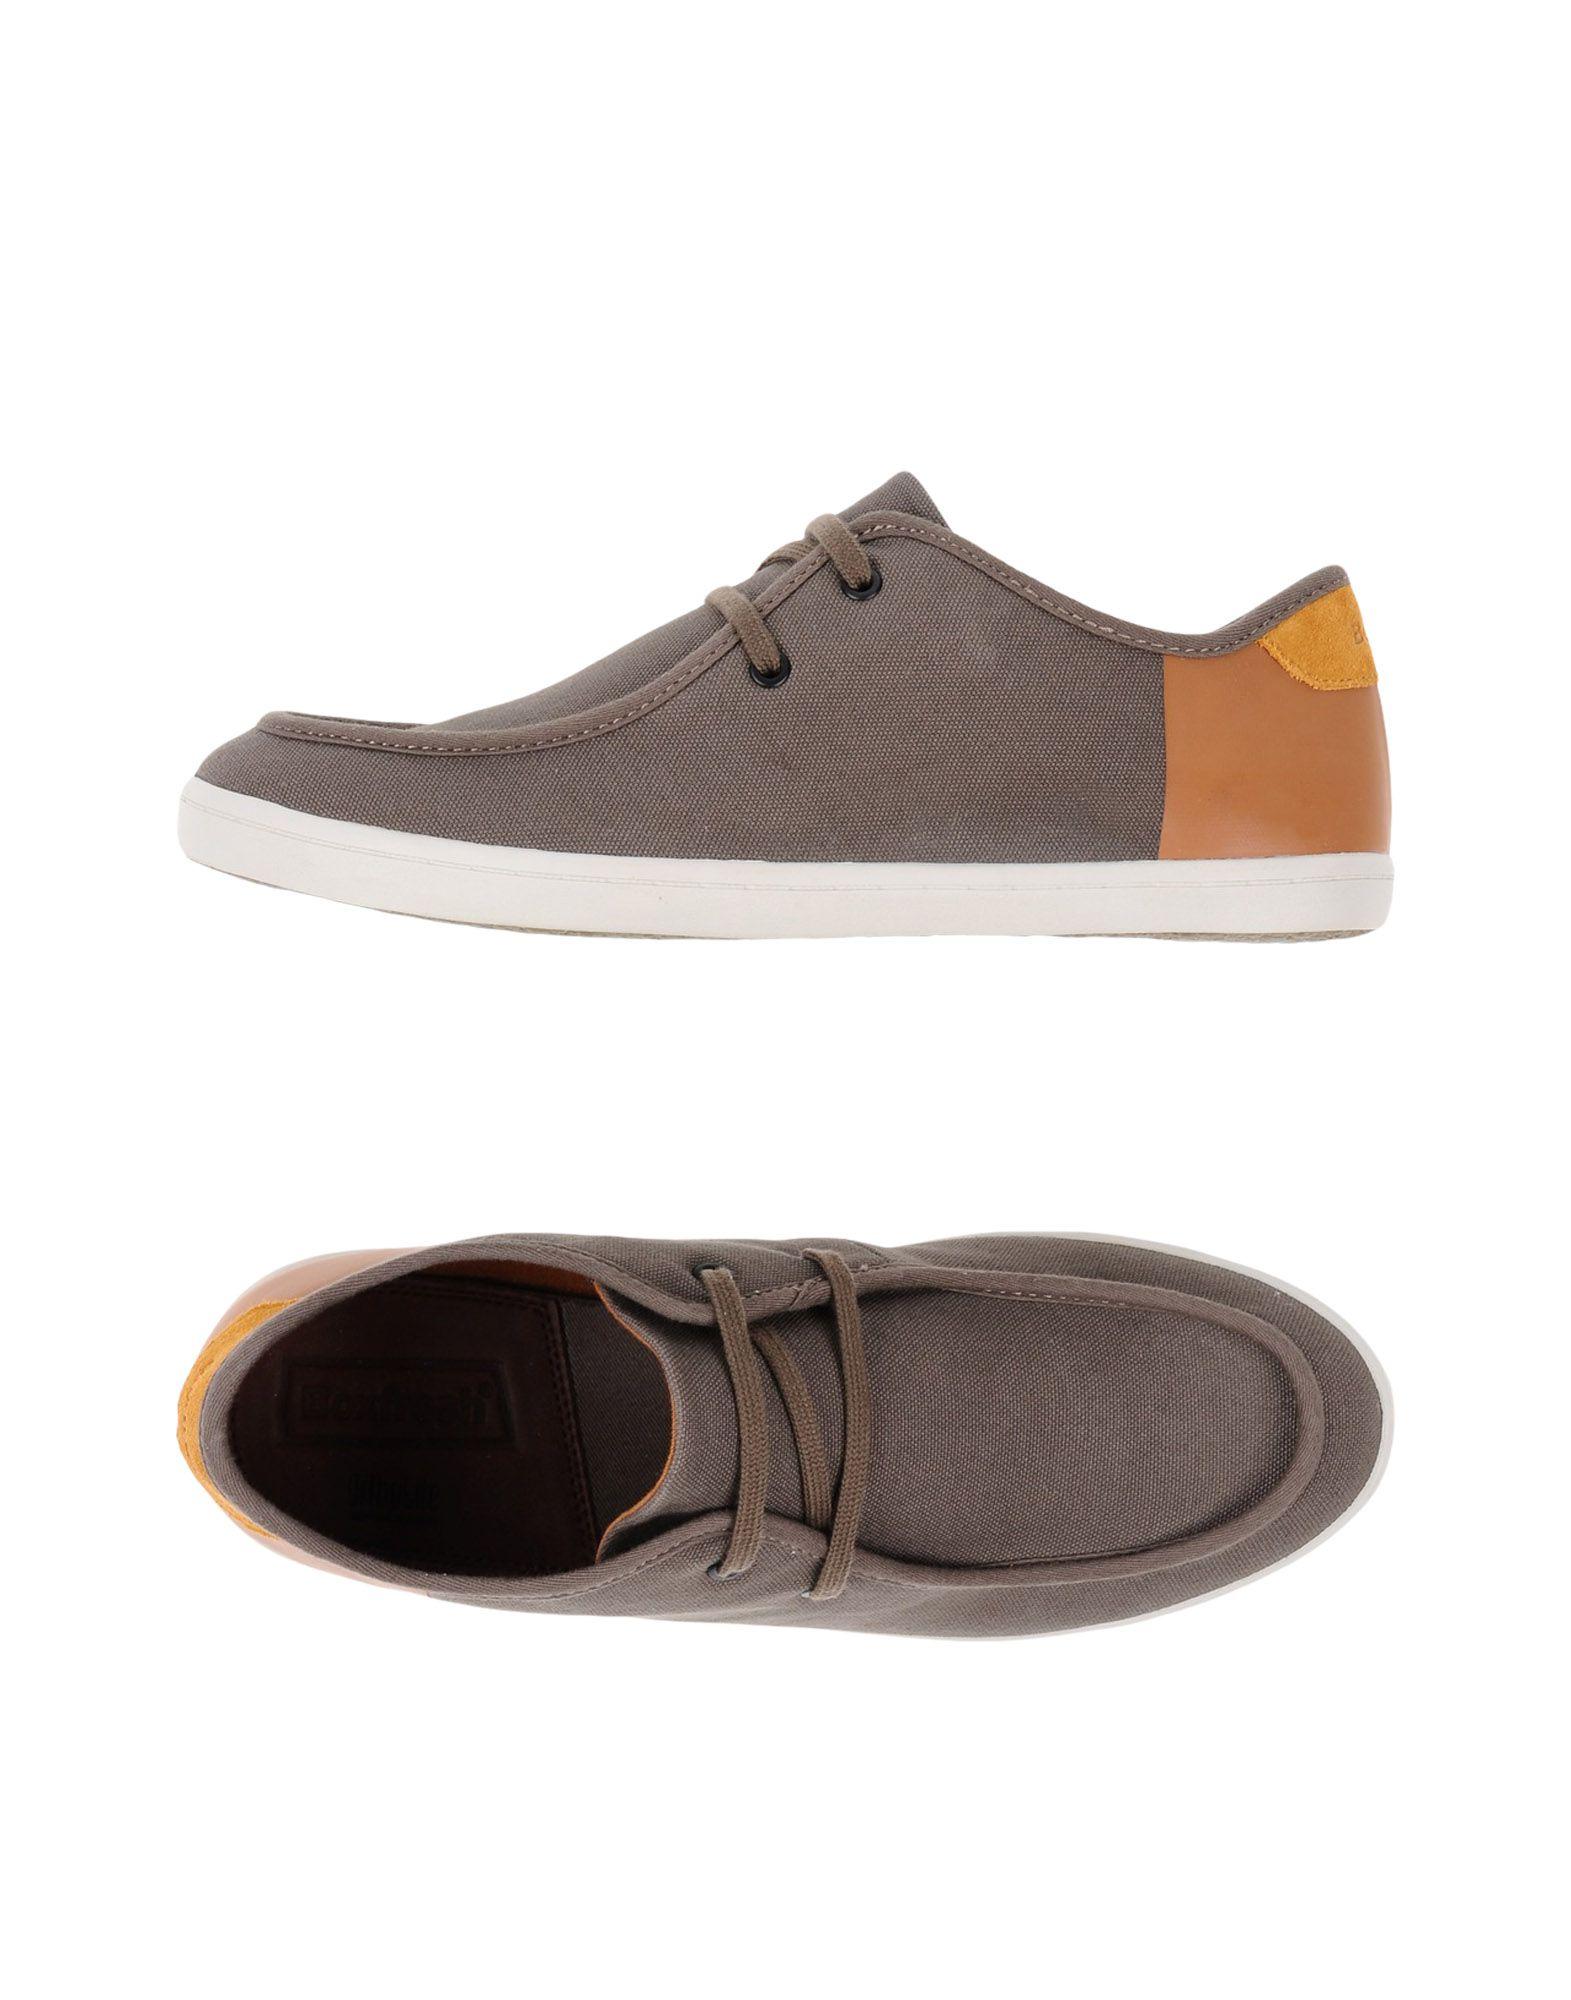 Herren Boxfresh Sneakers Herren   11333875VC Heiße Schuhe 1f0d80